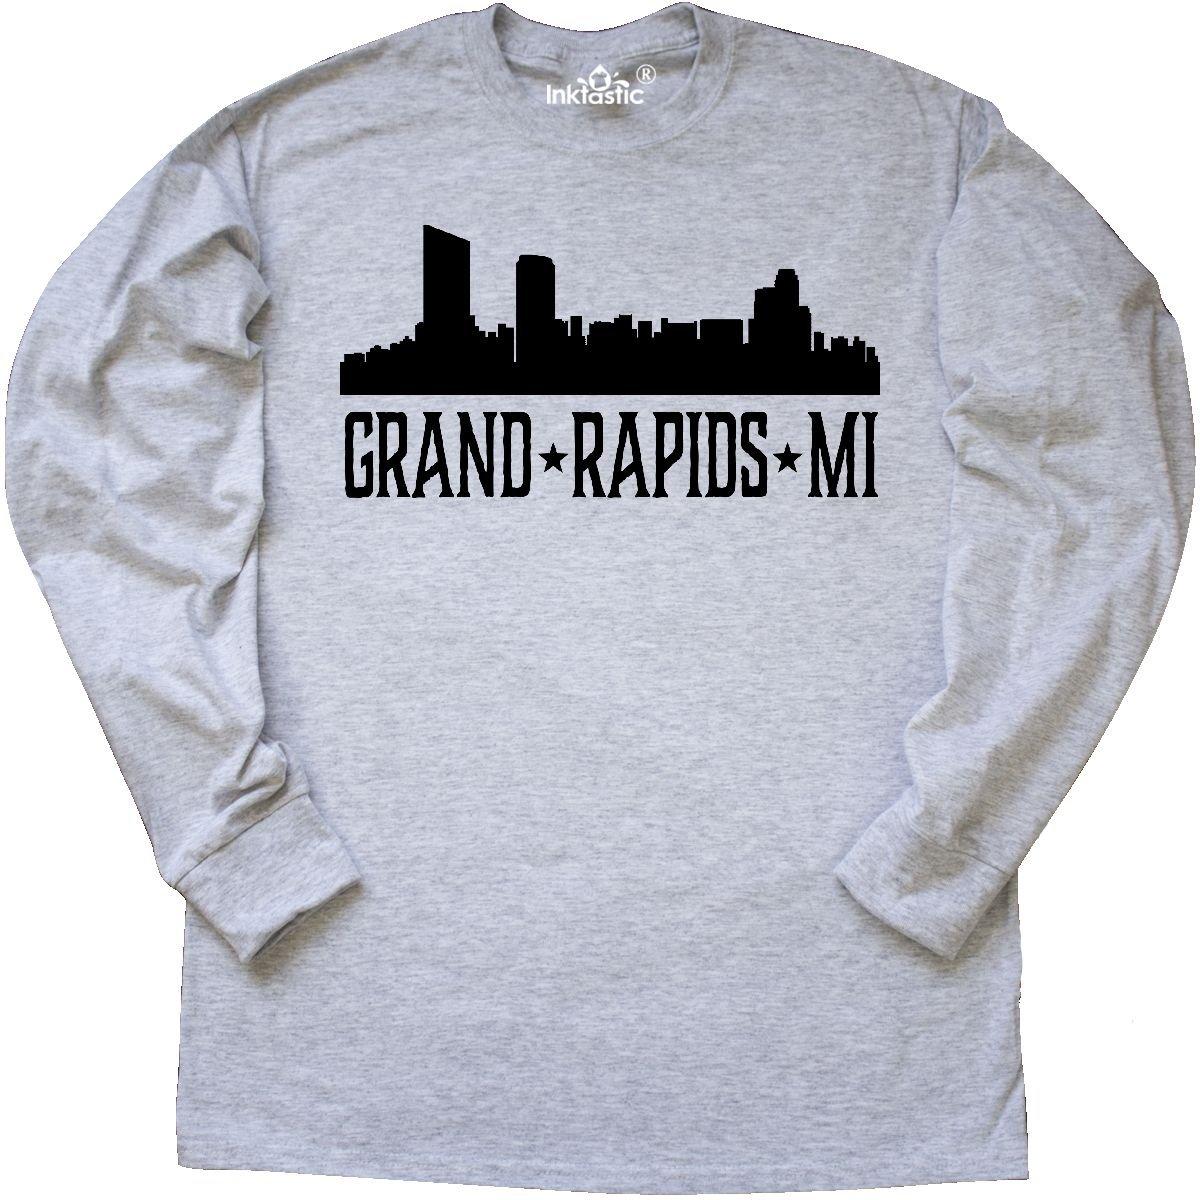 Inktastic Gramma Bear Grandma Tribal Gift Long Sleeve T-Shirt Clothing Present